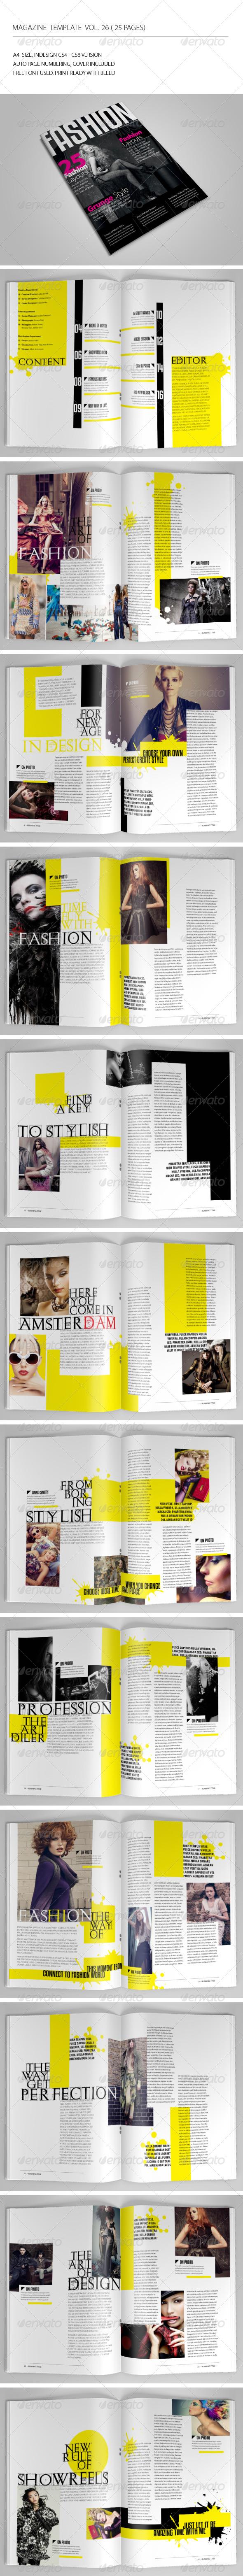 25 Pages Fashion Magazine Vol26 - Magazines Print Templates